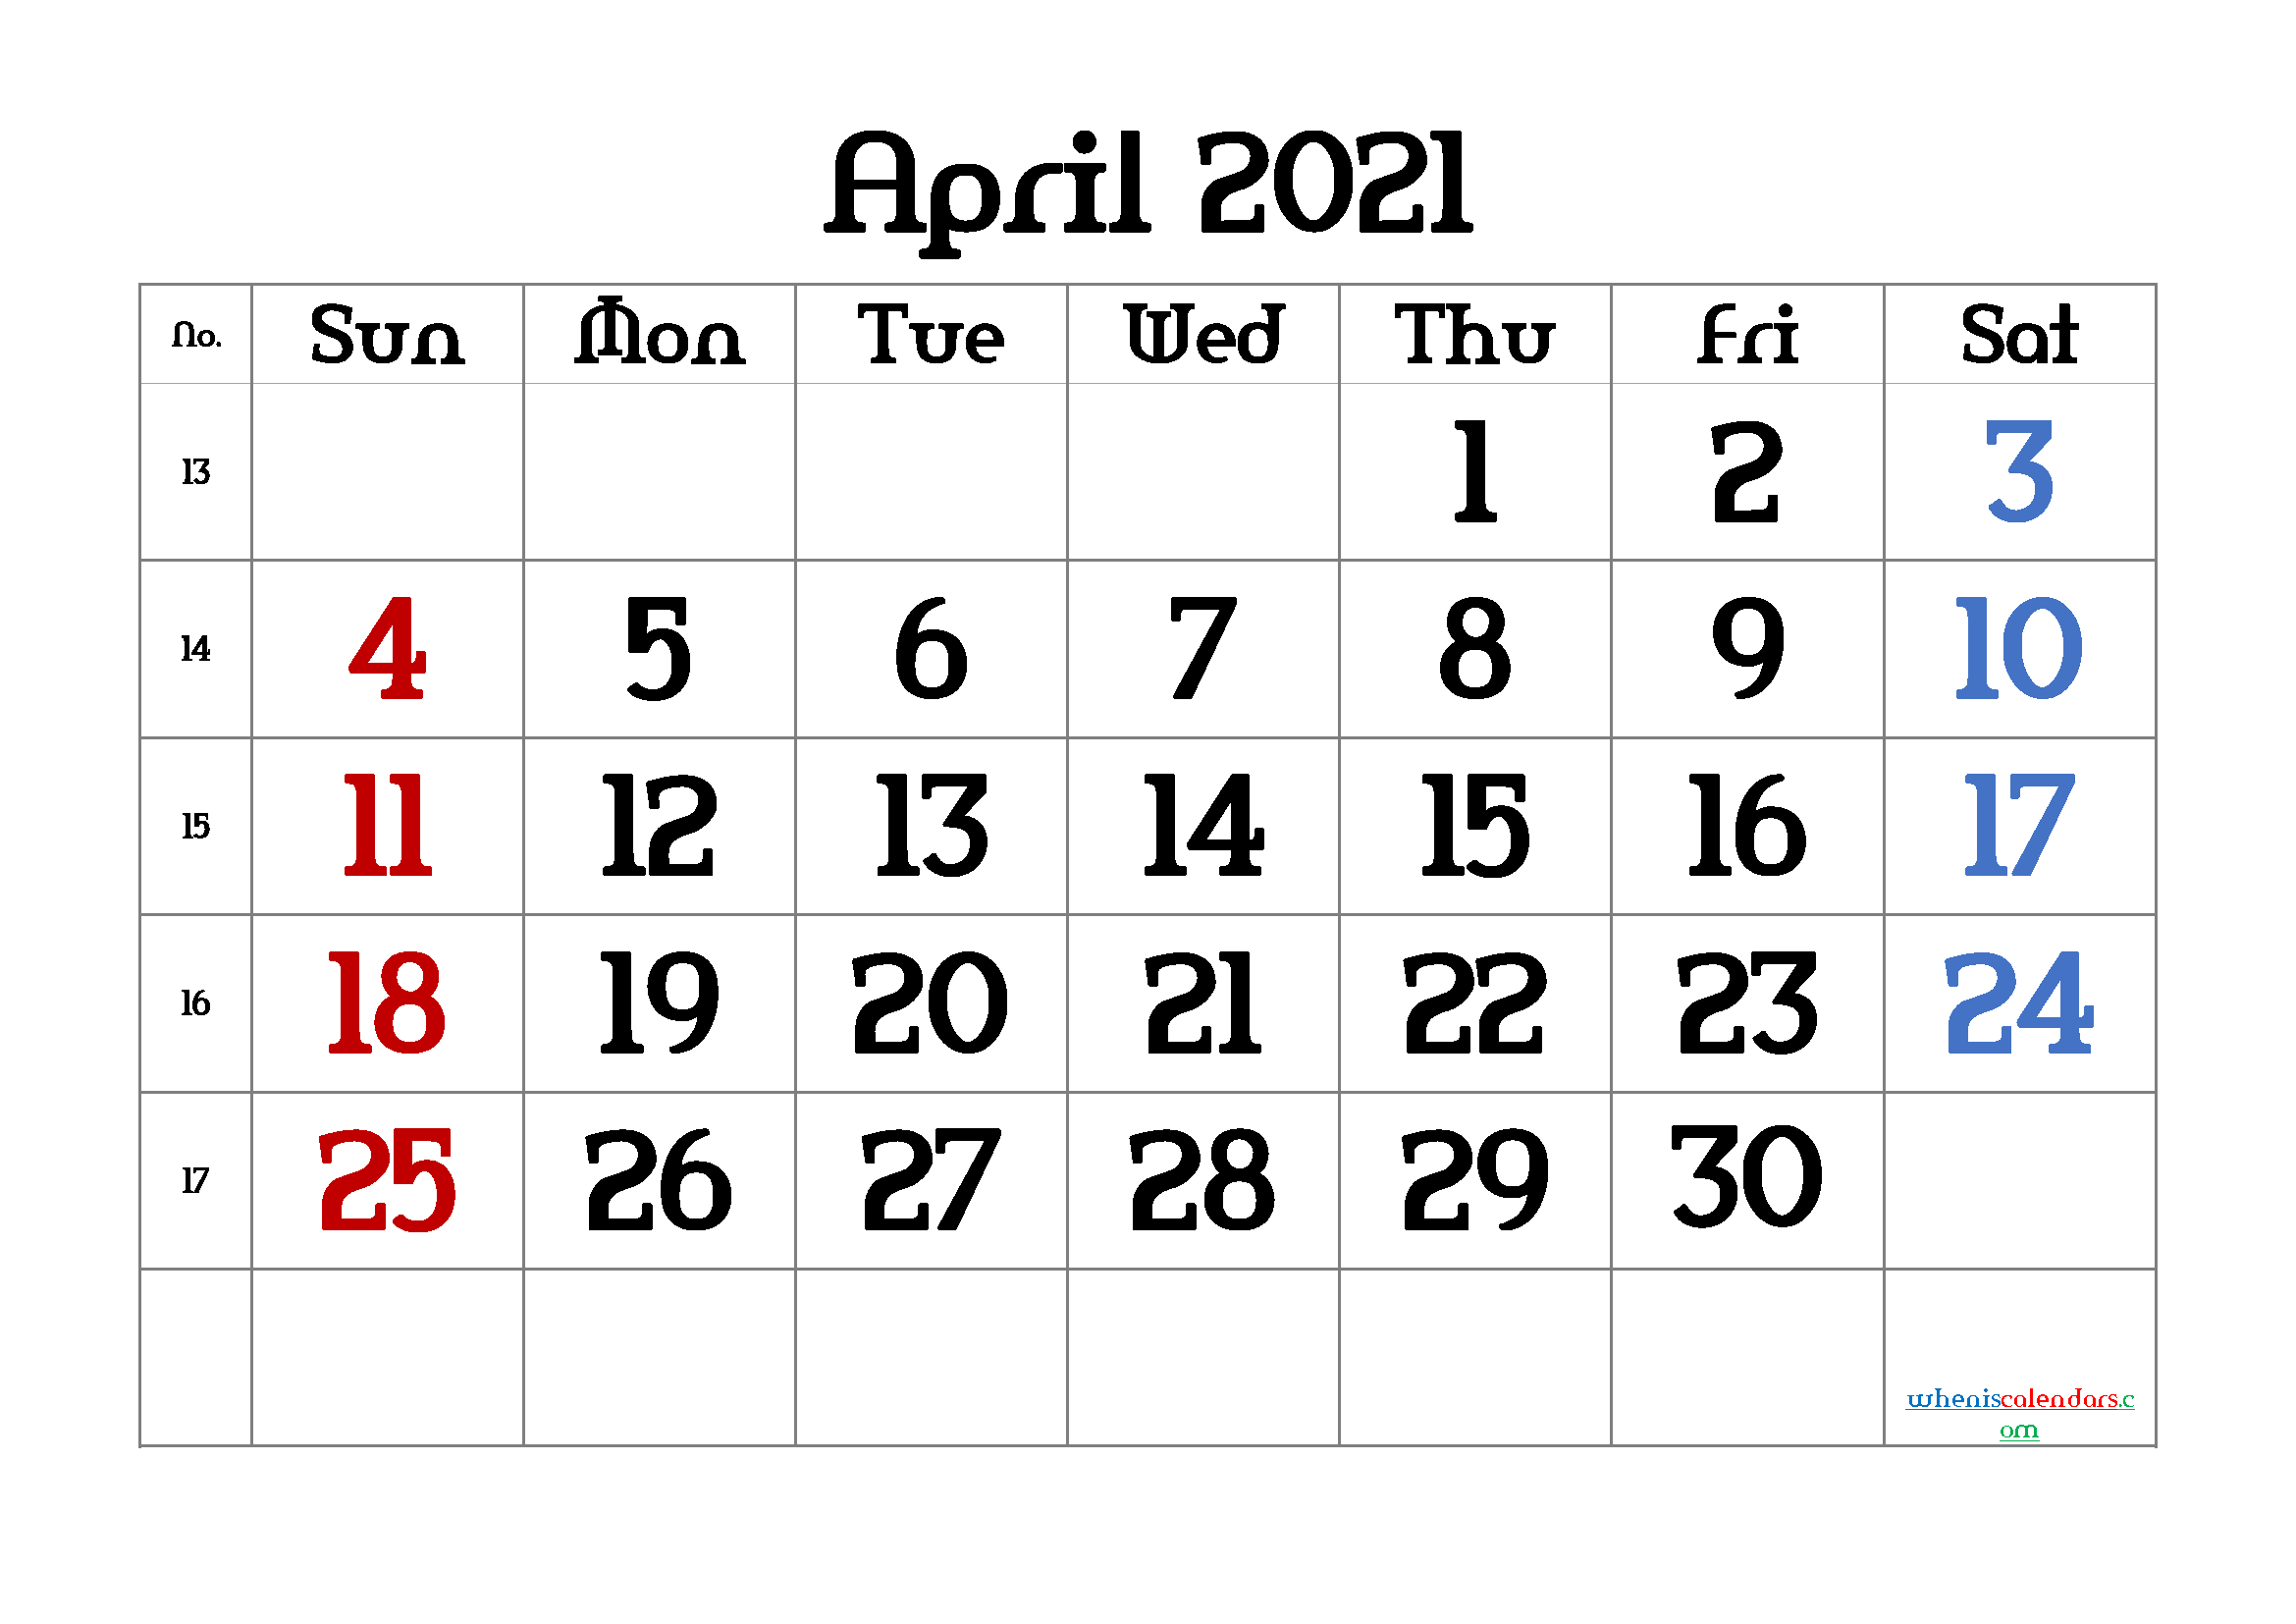 Free Printable Calendar April 2021 2022 And 2023 And More